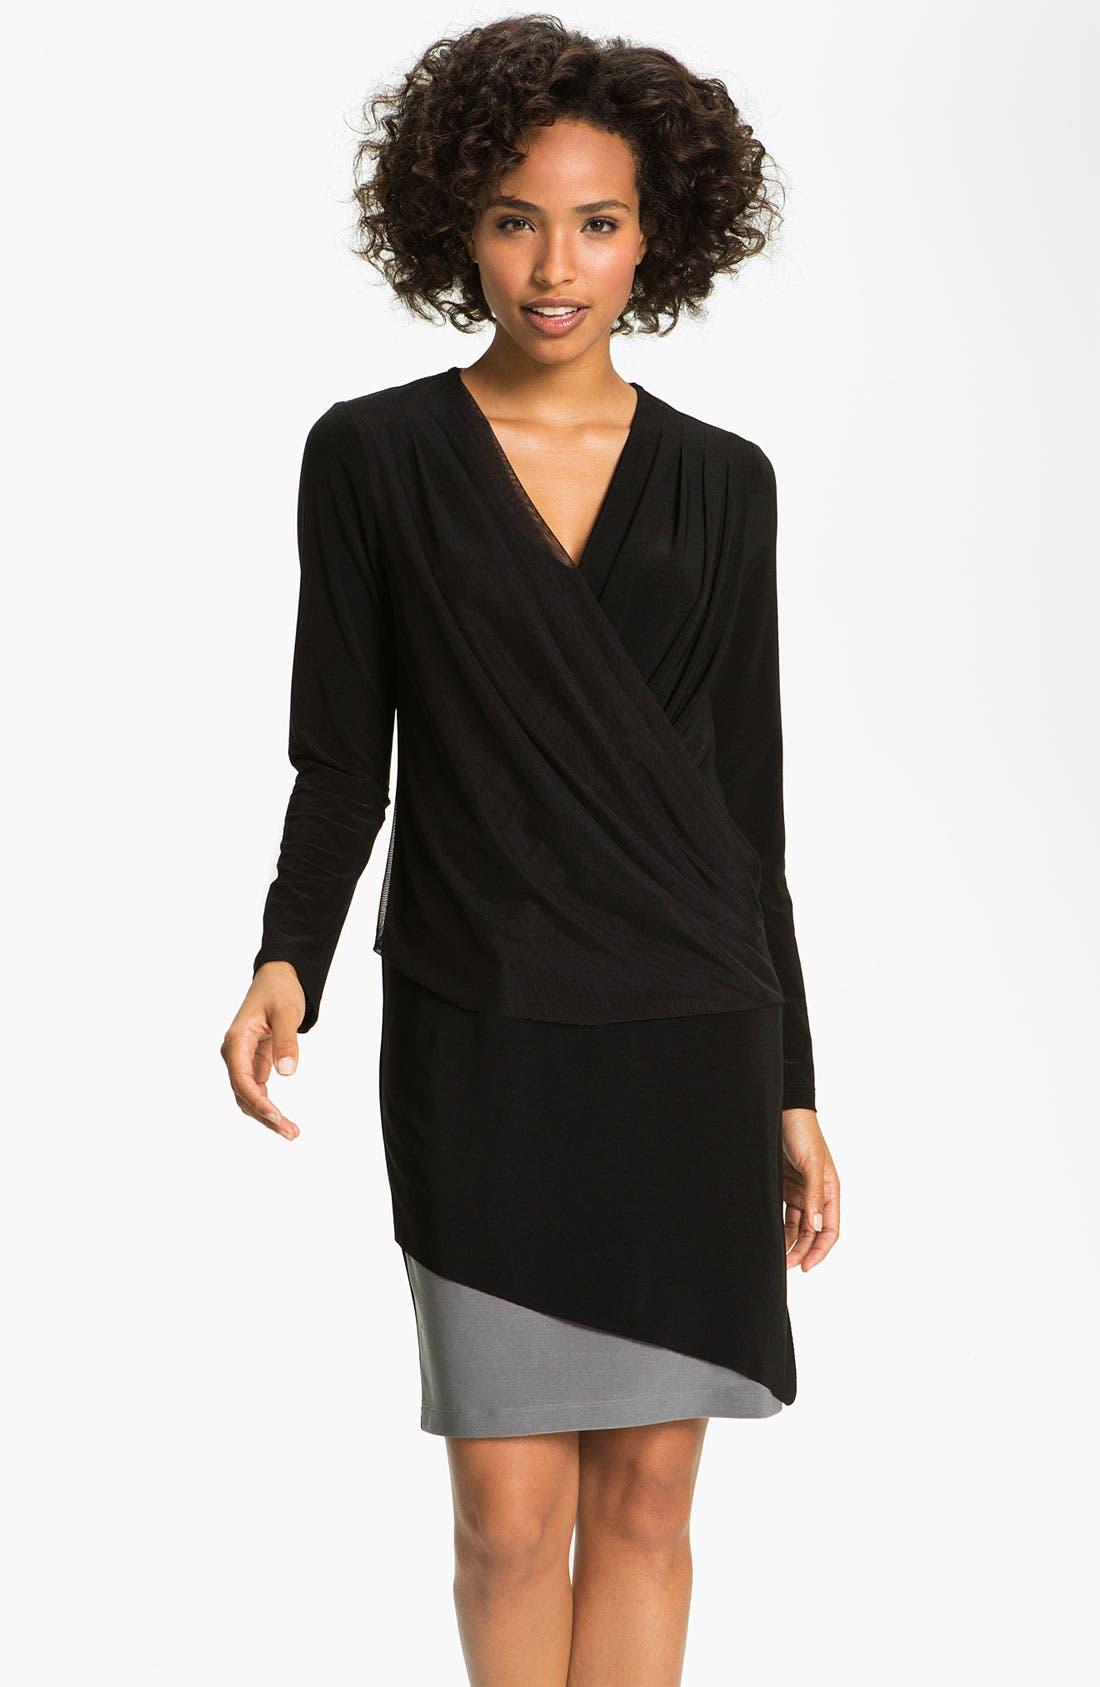 Main Image - Alex & Ava Surplice Mesh & Jersey Dress (Petite)